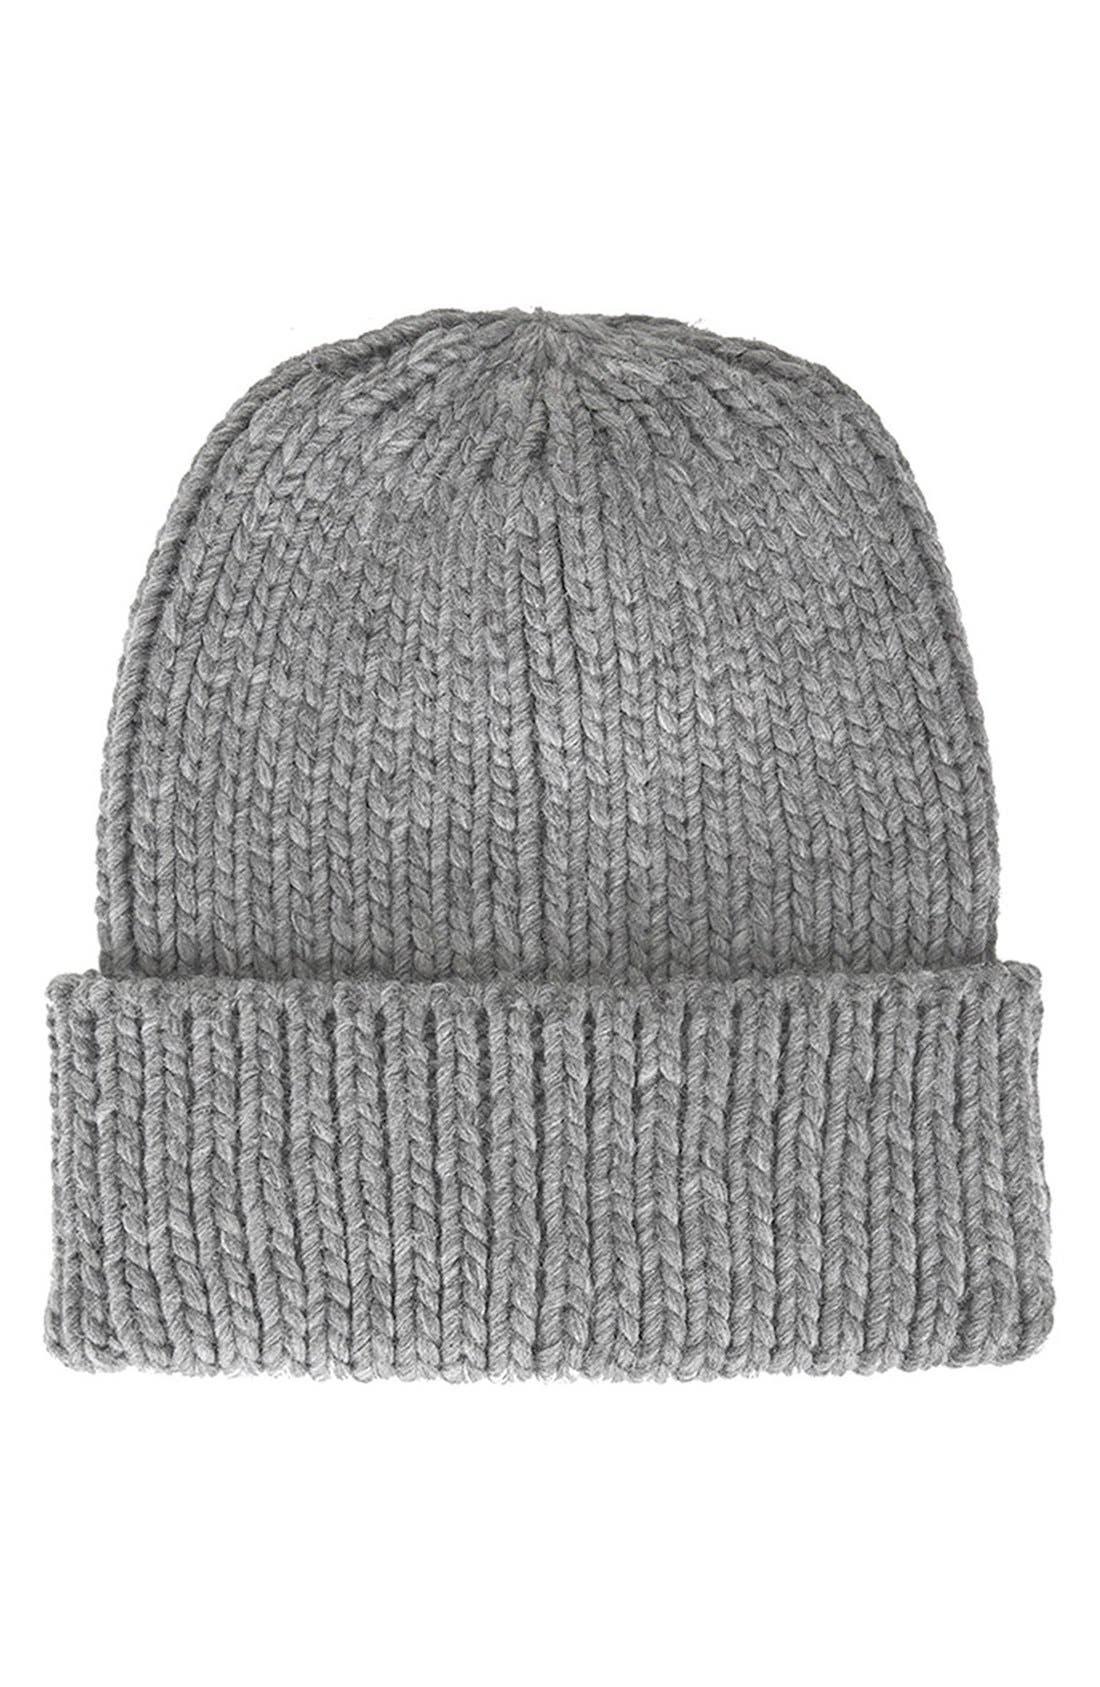 Alternate Image 1 Selected - Topshop Rib Knit Beanie